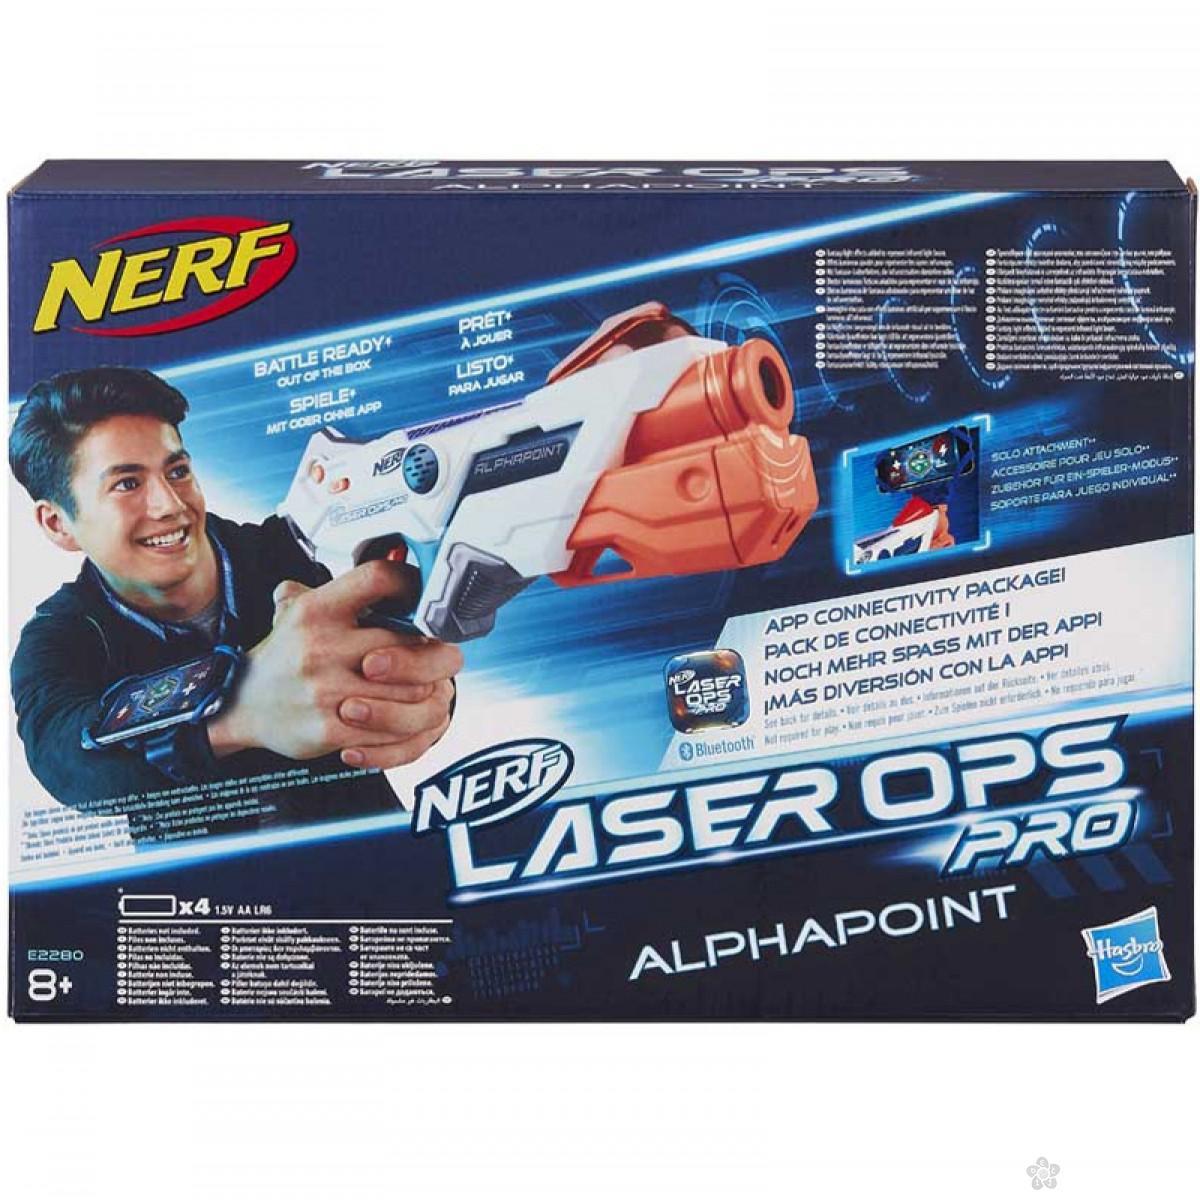 Puška laser Nerf  Alphapoint E2280